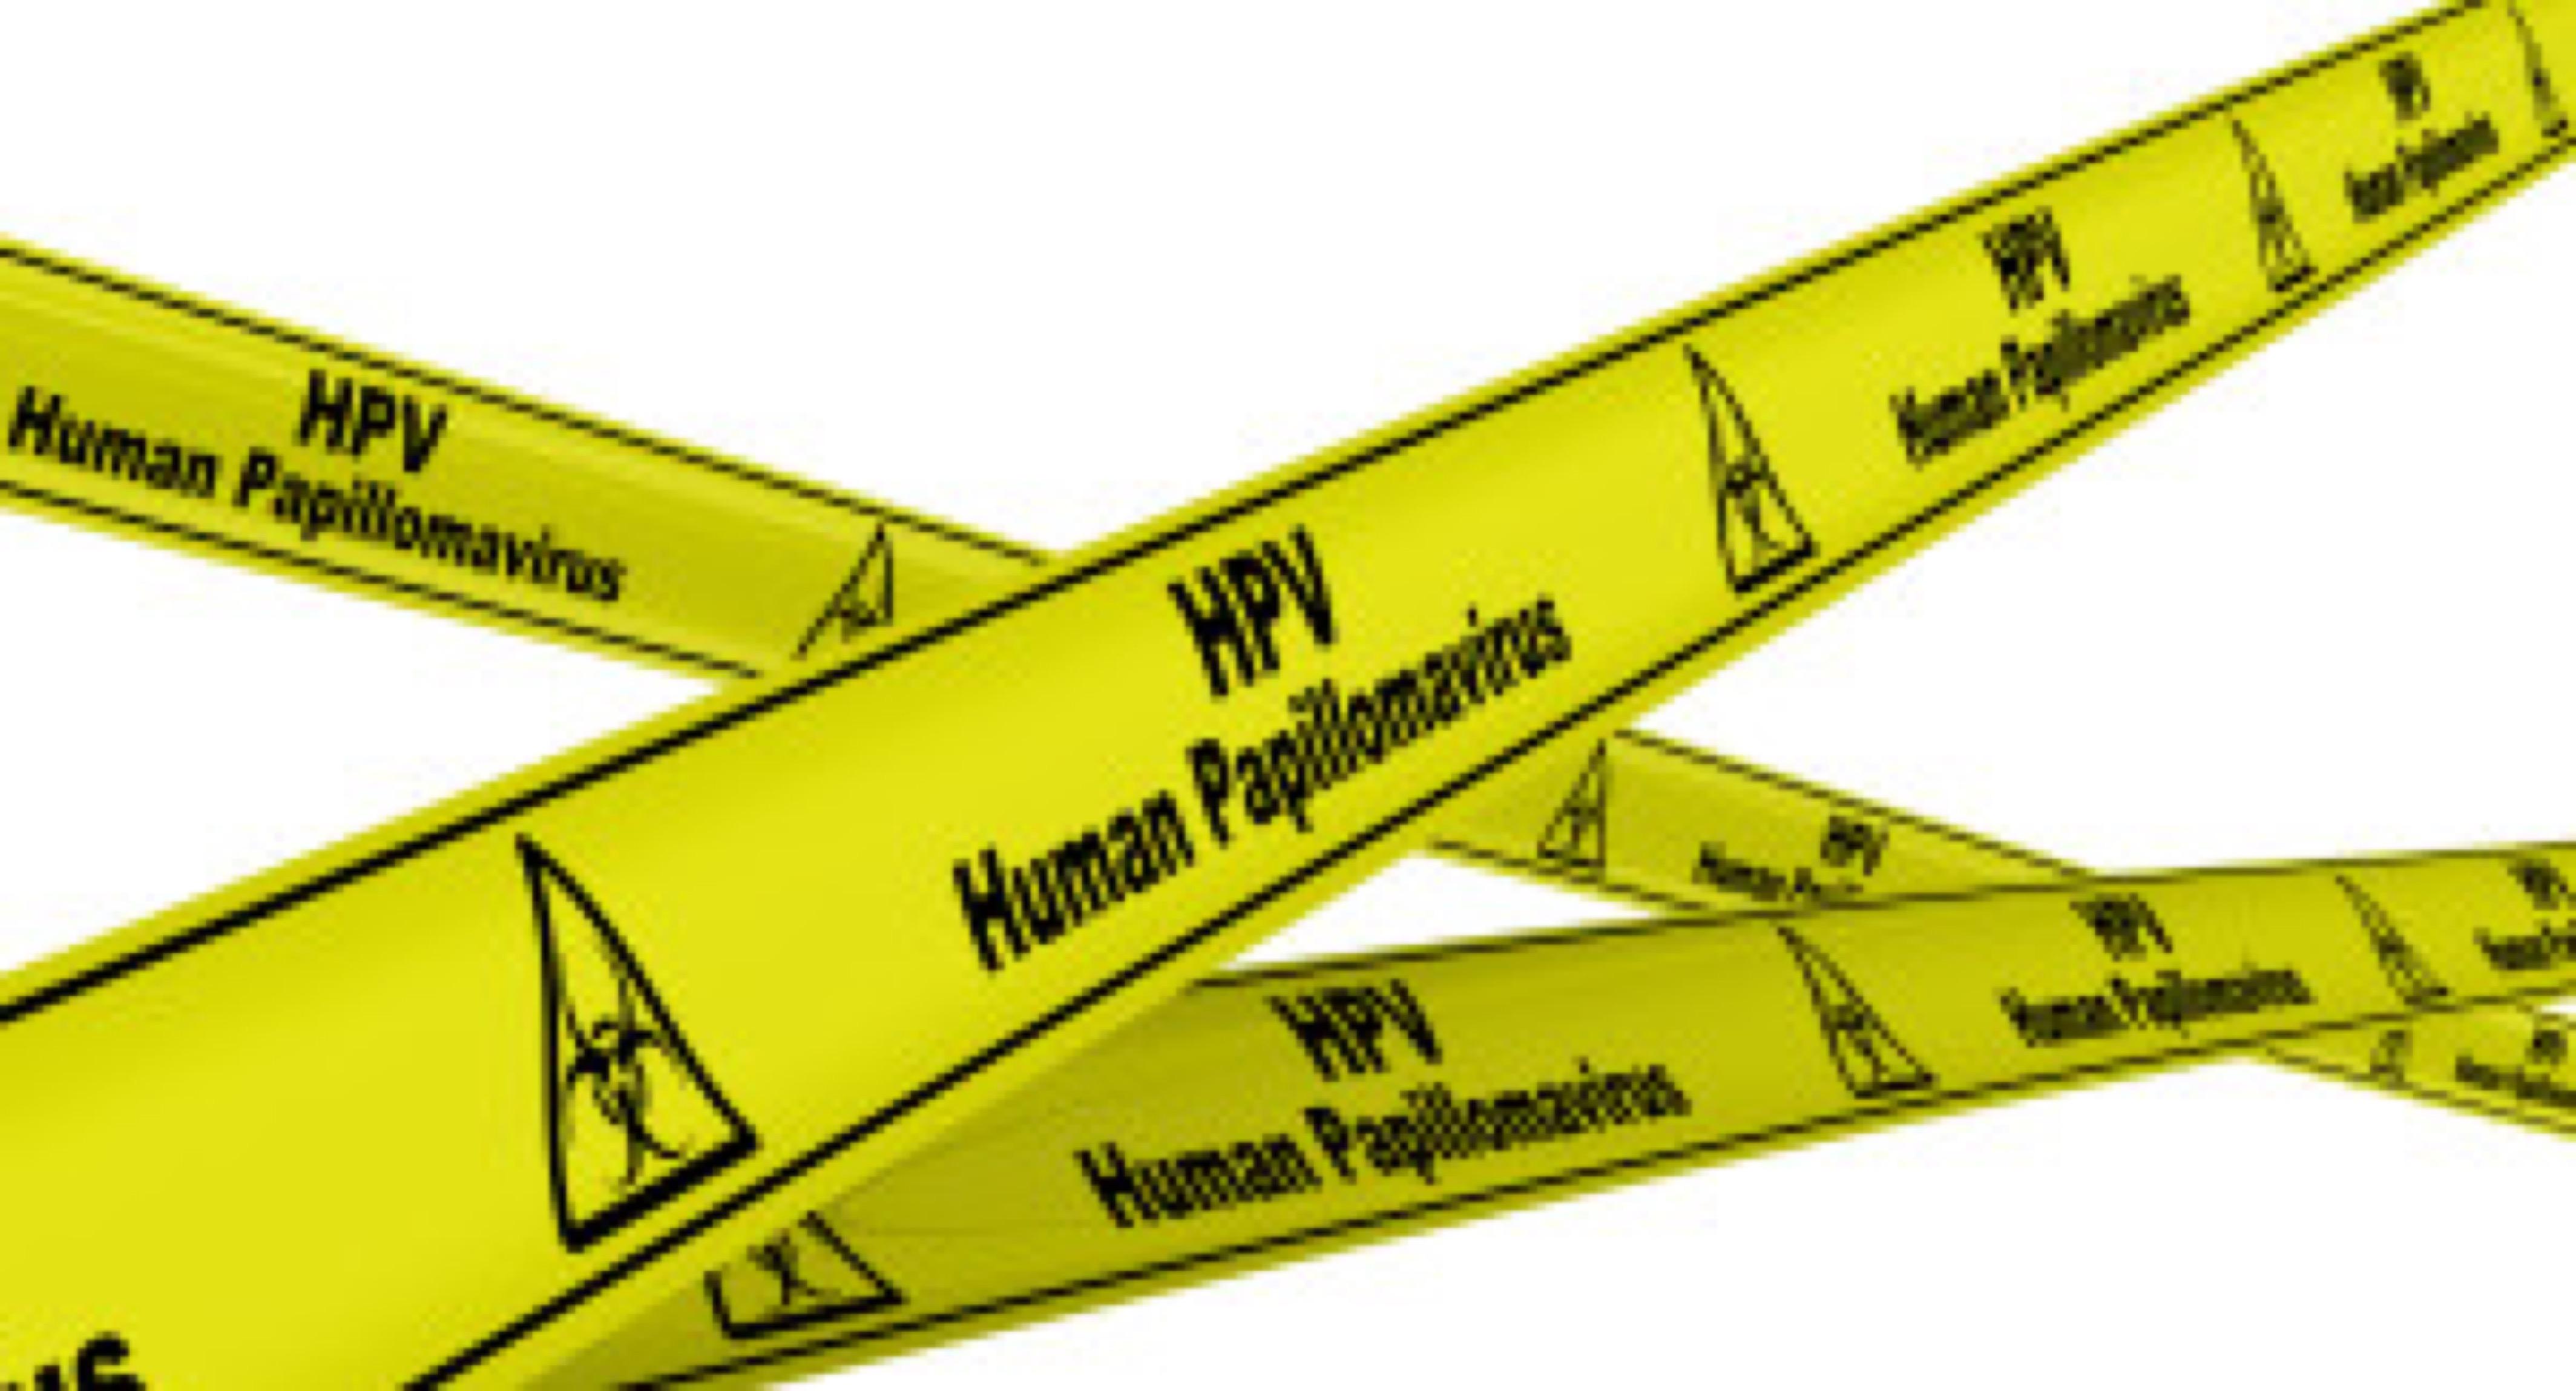 Human Papillomavirus. Yellow warning tapes